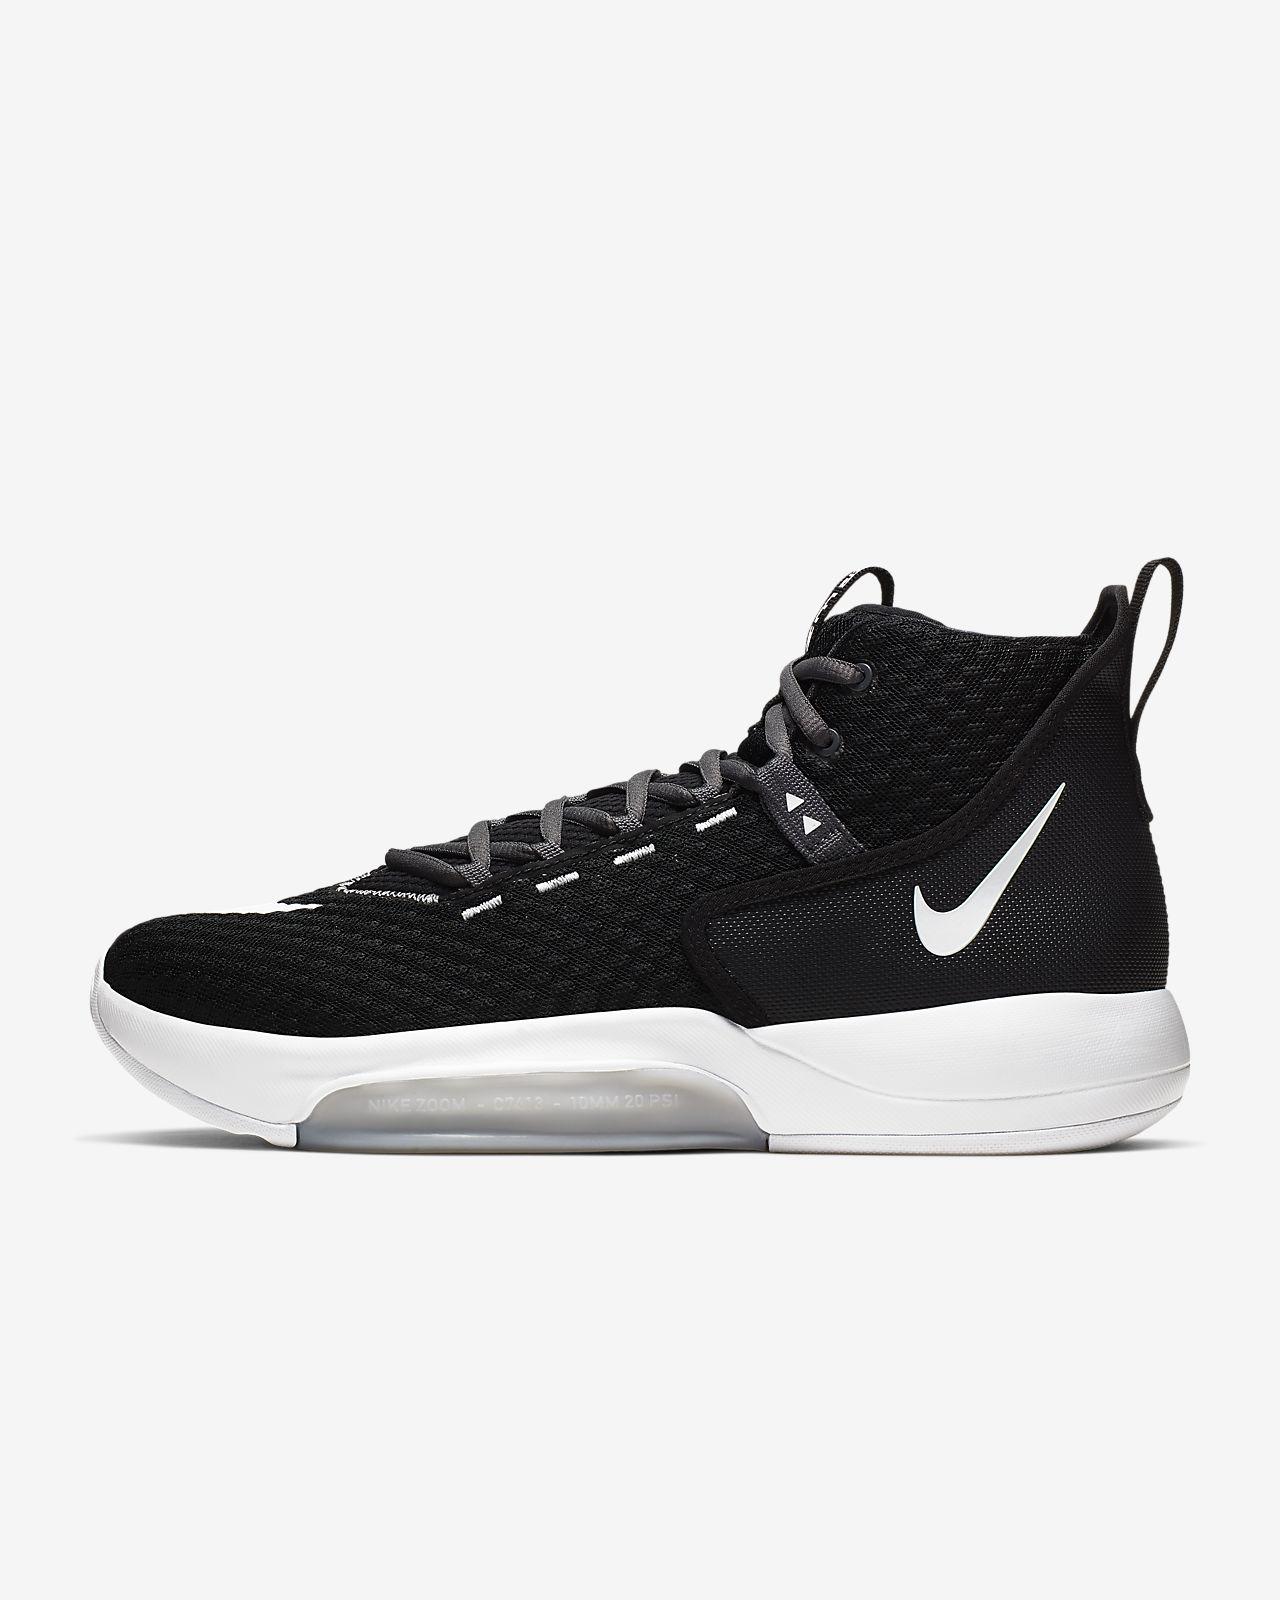 Nike ZoomRize TB男子篮球鞋